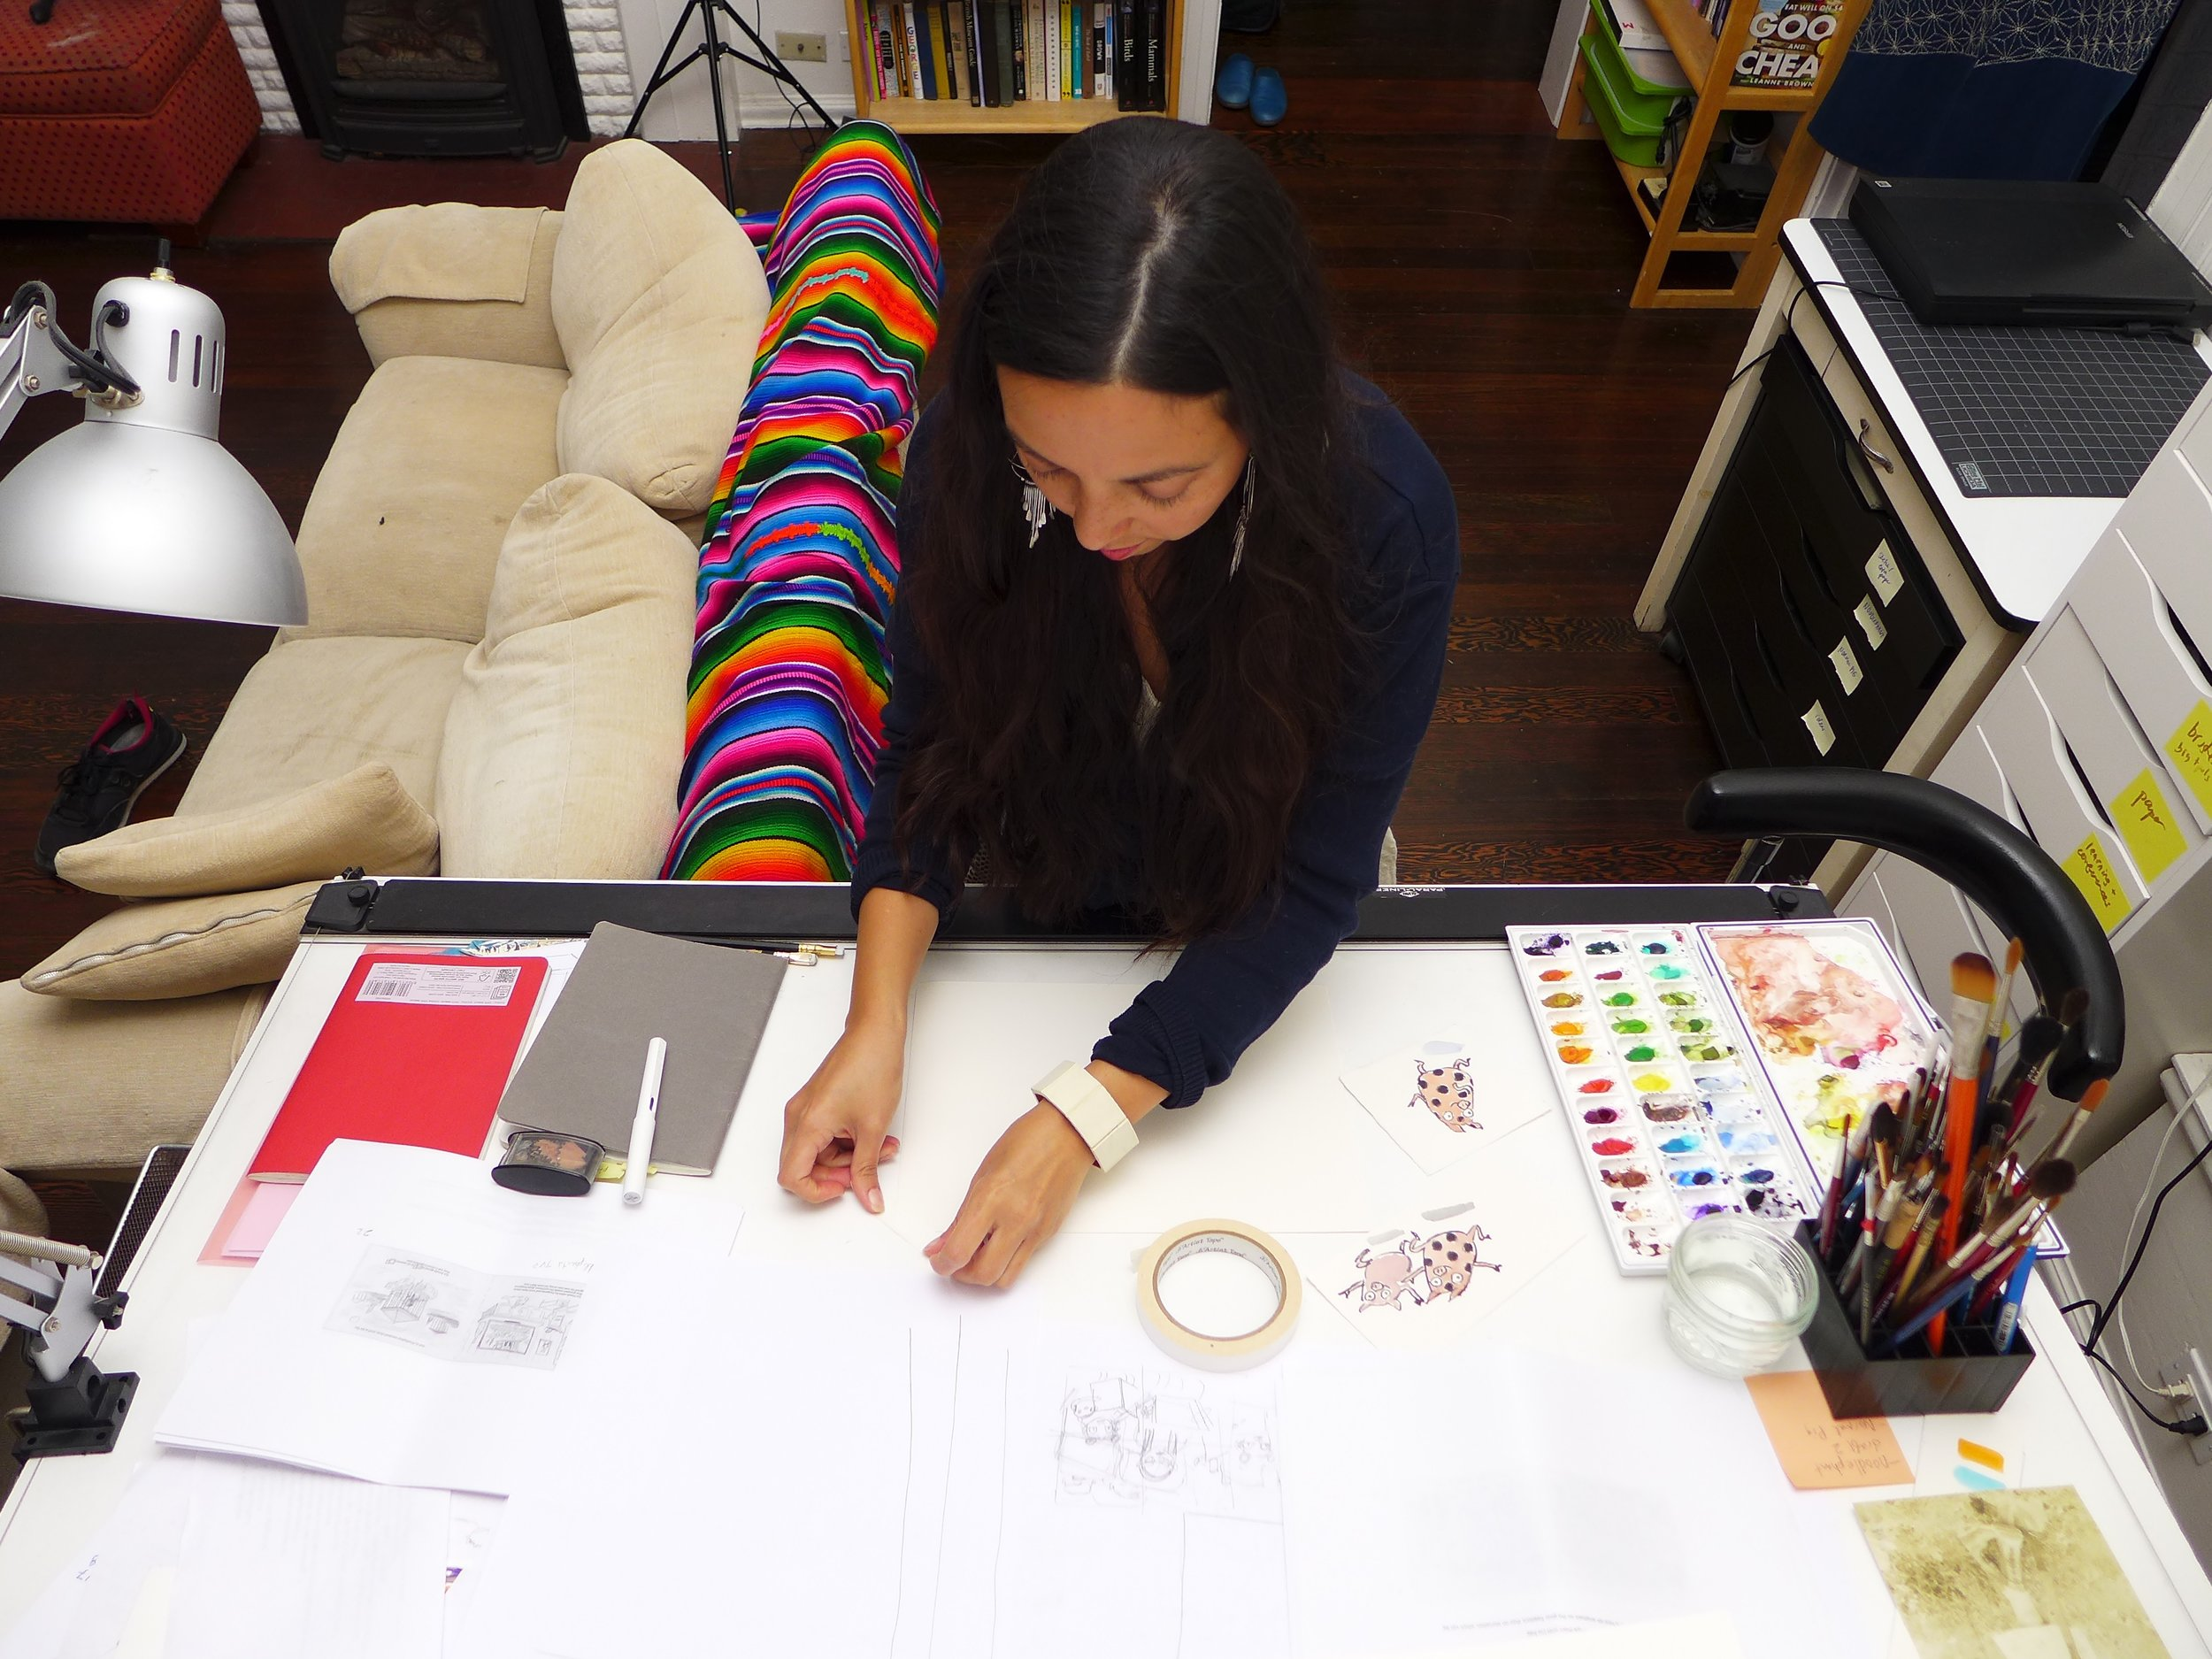 K-Fai Steele in her home studio - Photo: RL Davis